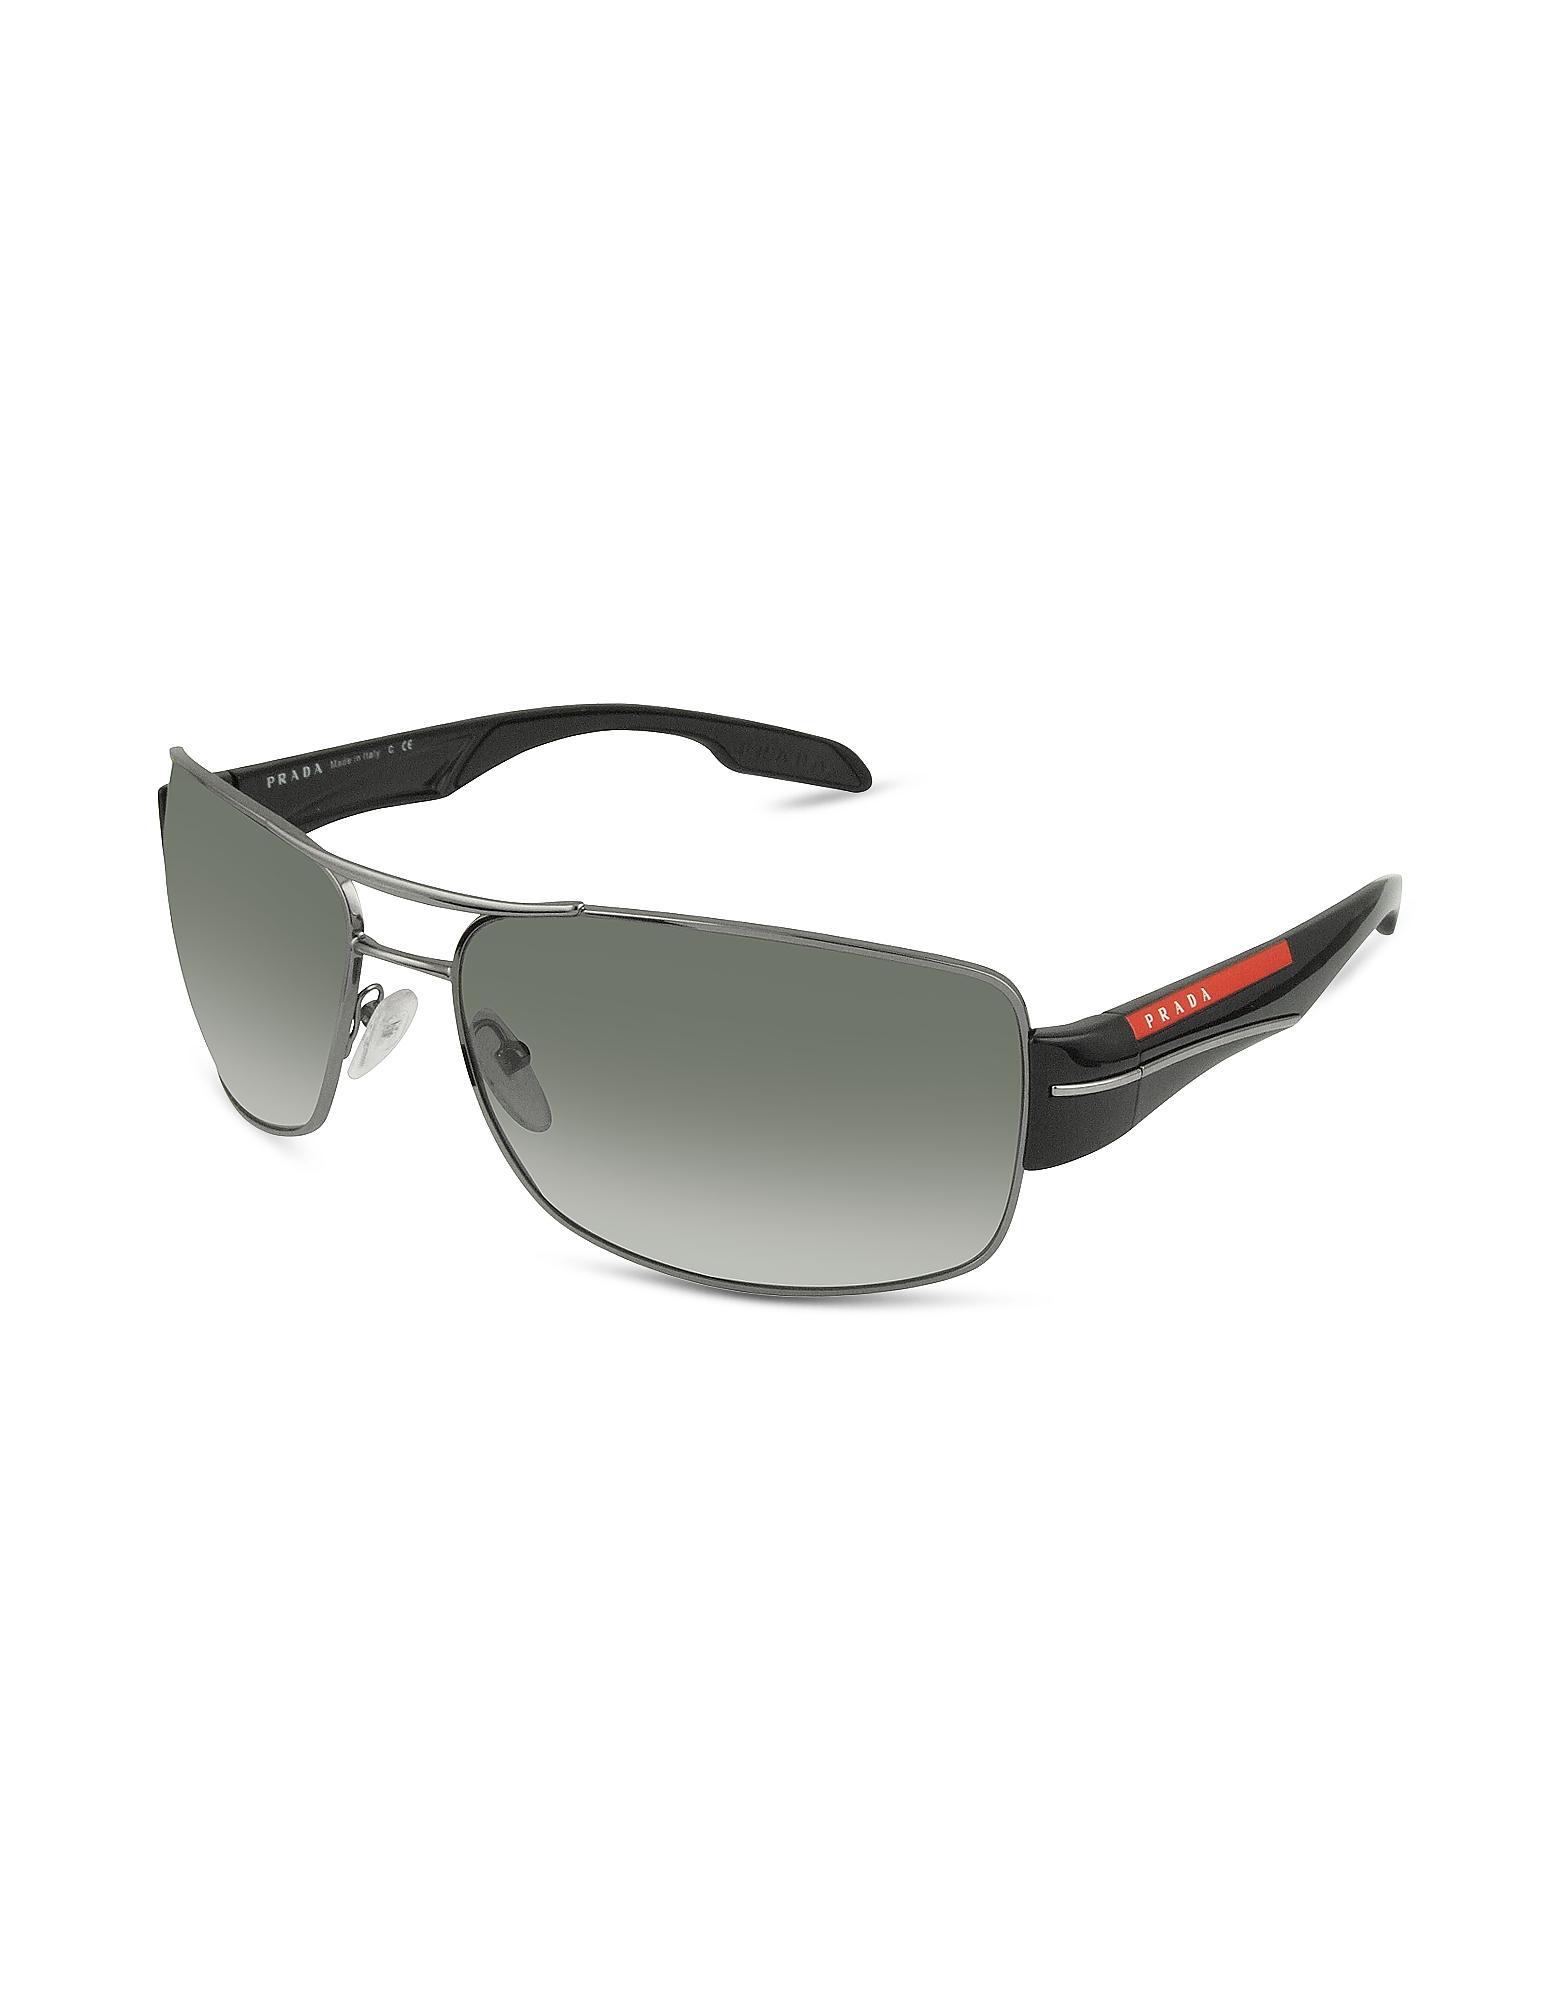 Prada Sunglasses, Rectangle Metal Frame Sunglasses